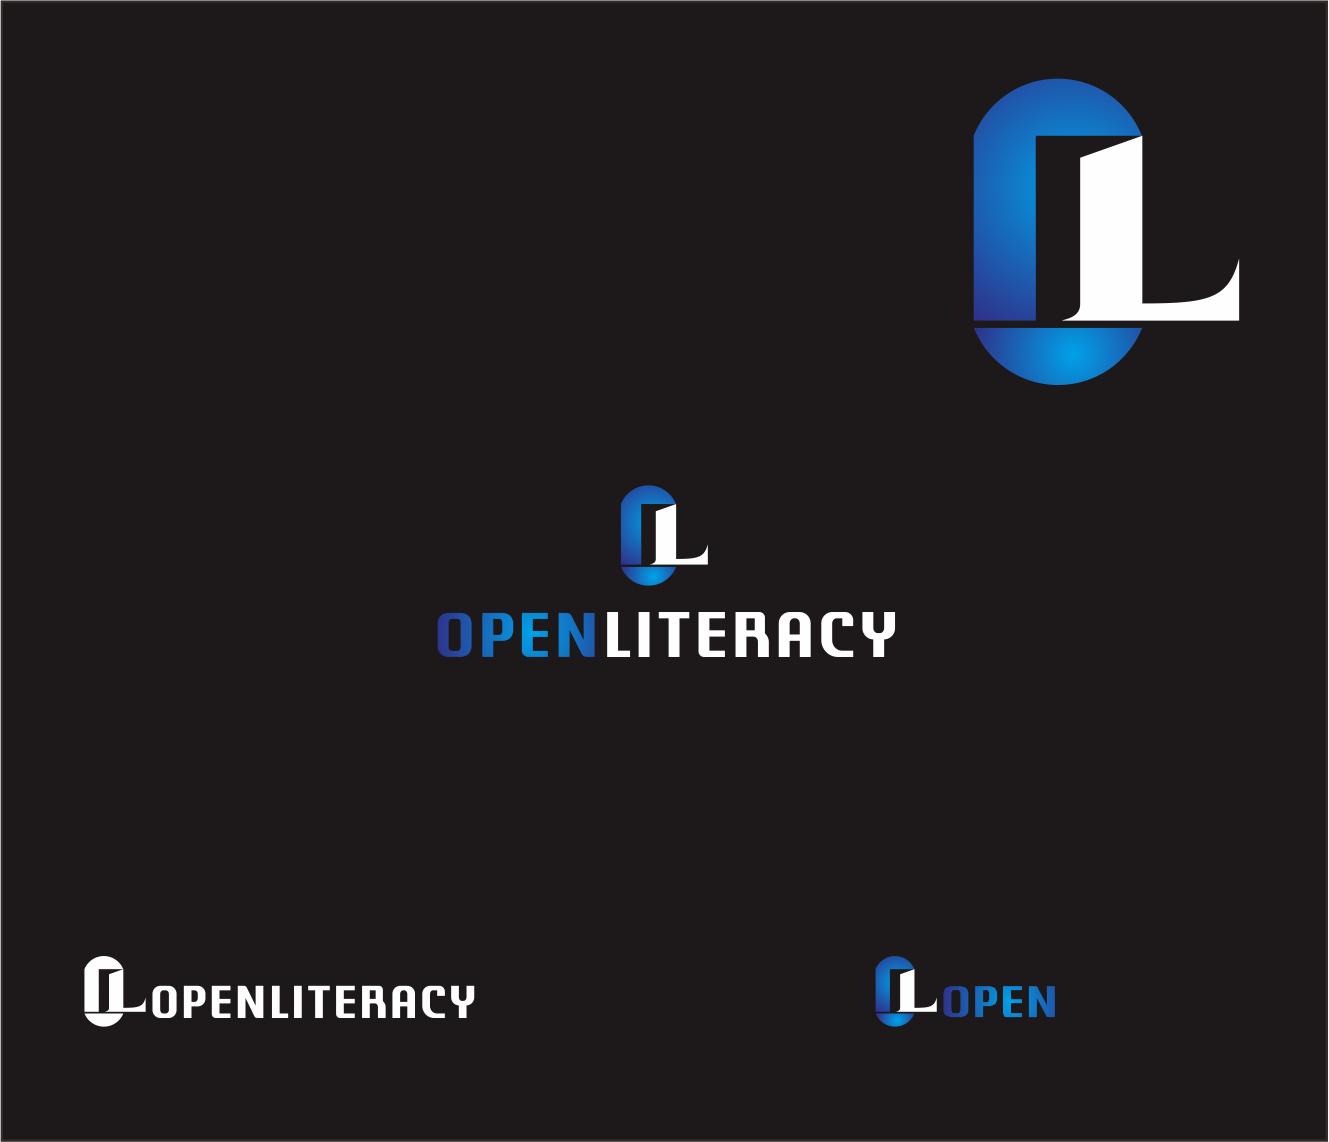 Logo Design by Armada Jamaluddin - Entry No. 98 in the Logo Design Contest Inspiring Logo Design for OpenLiteracy.